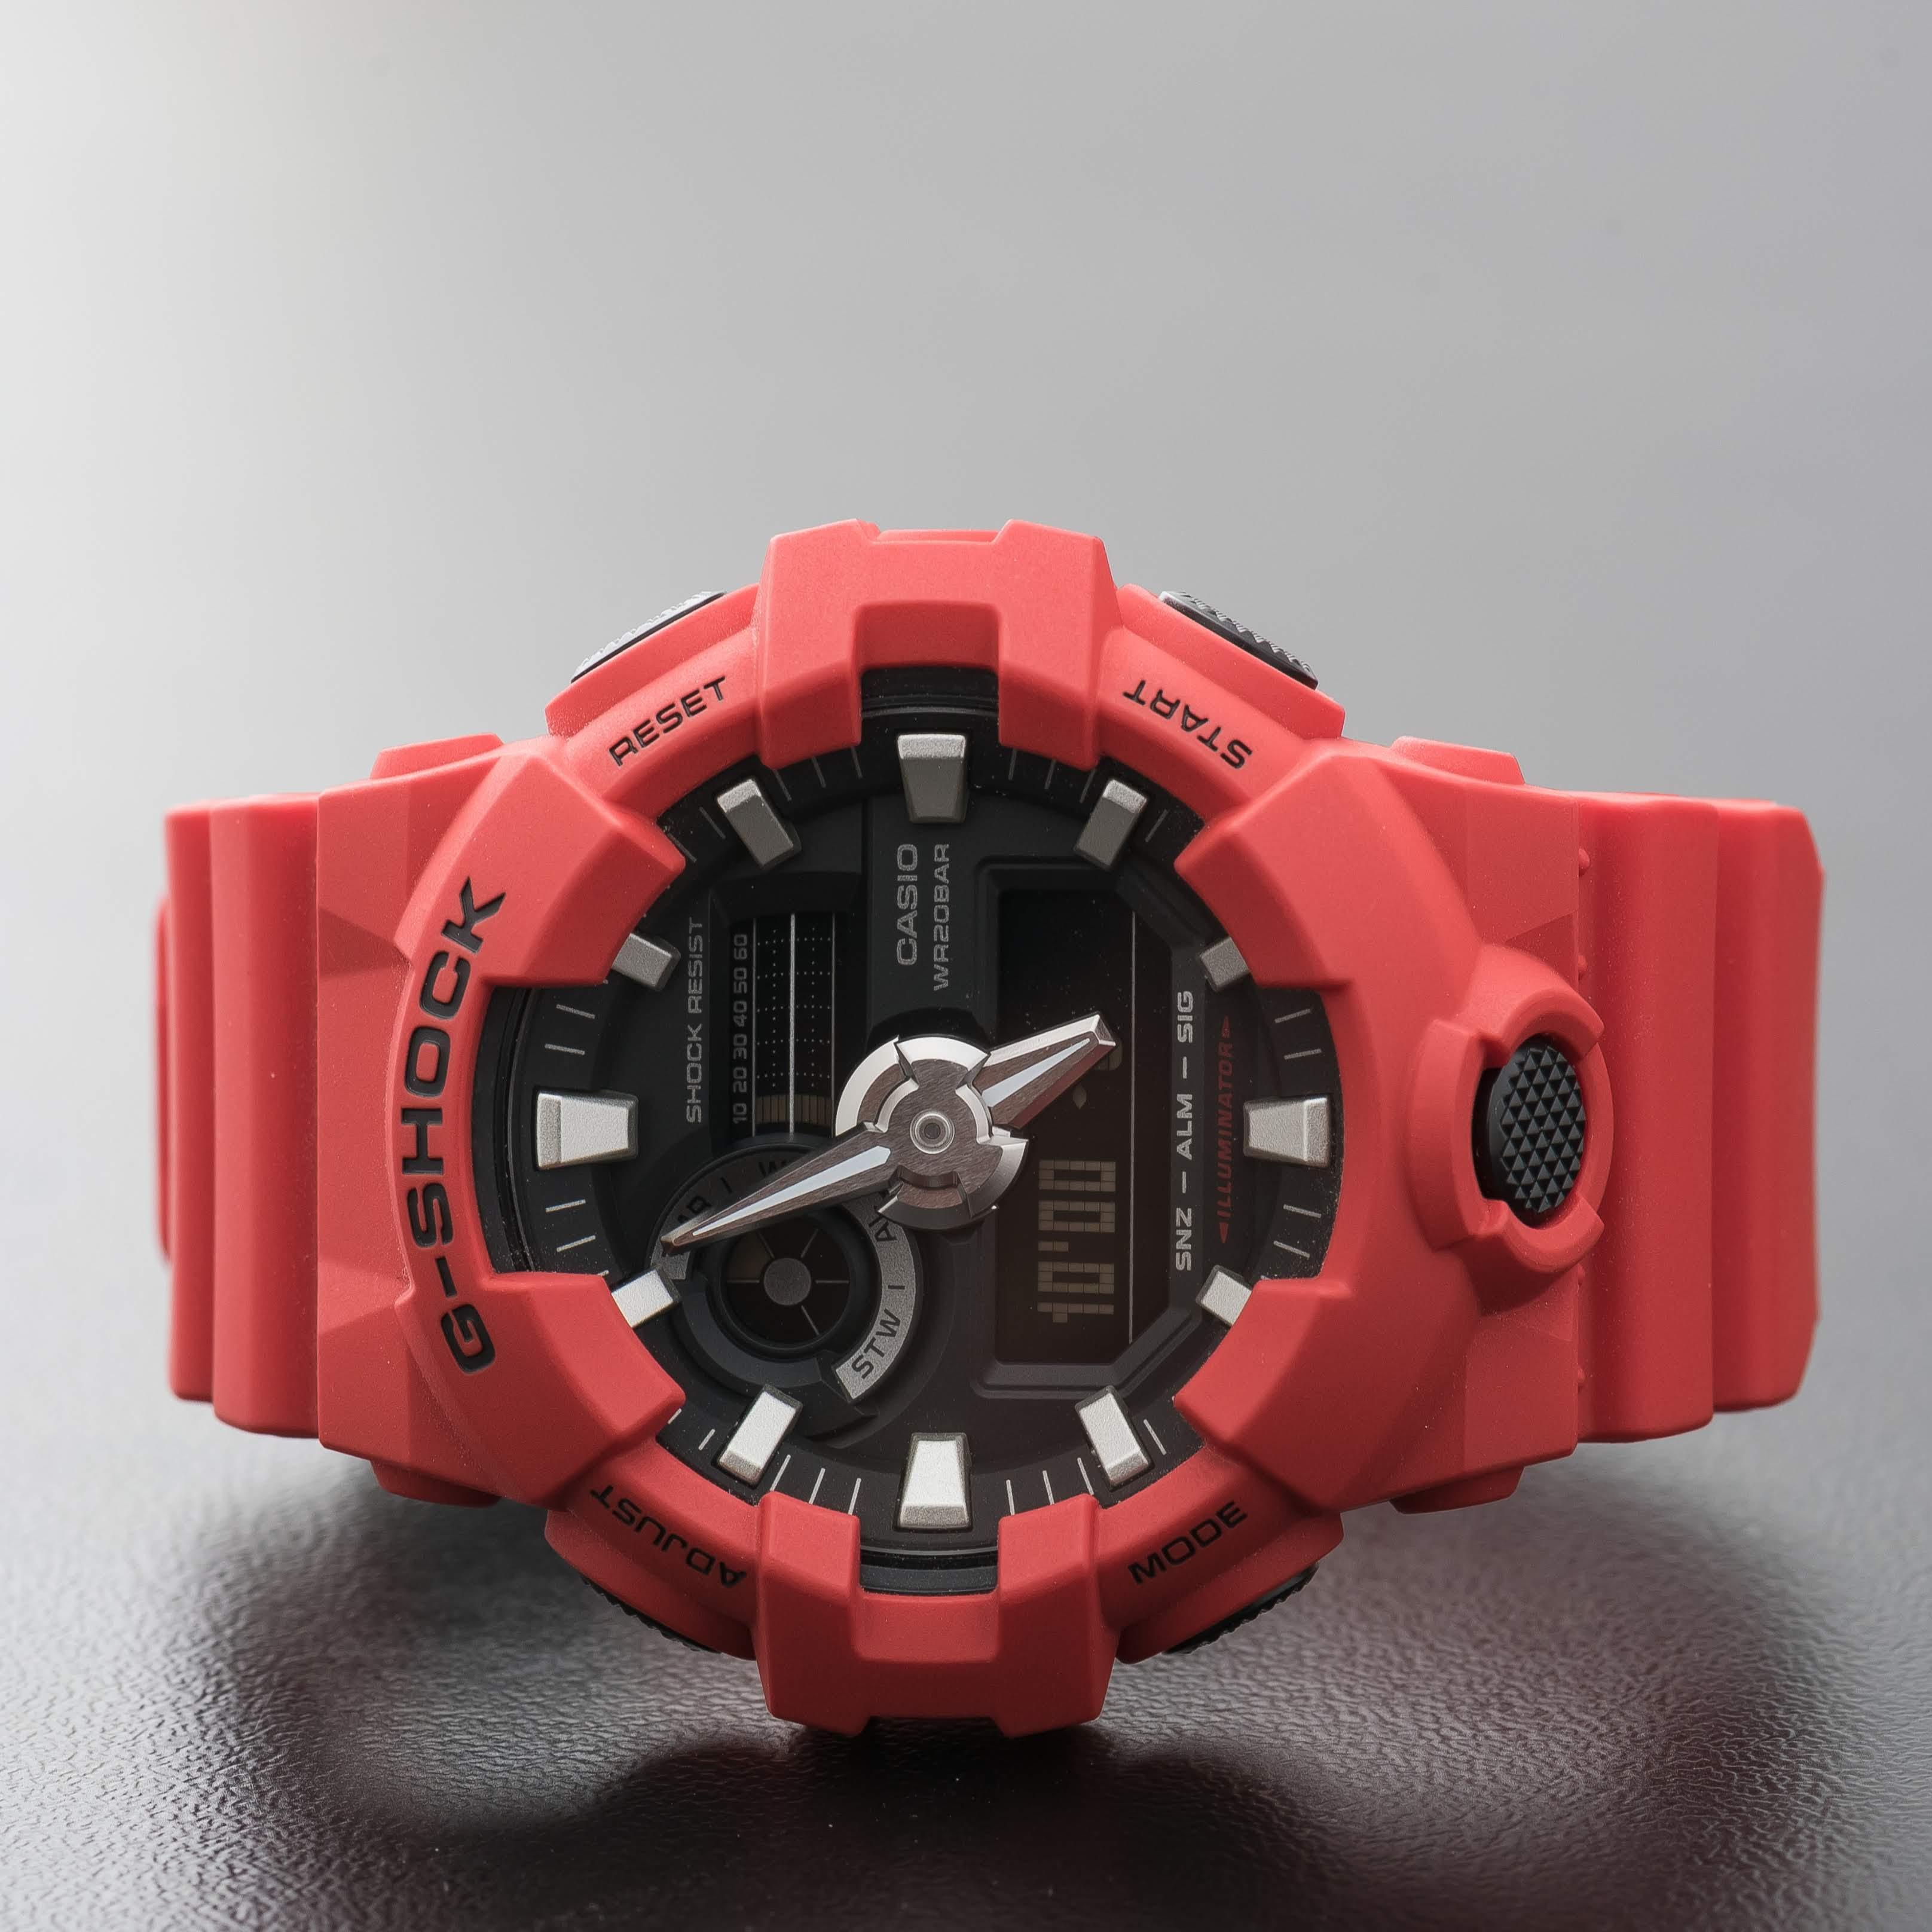 Casio G-Shock Analog Digital Red Resin World Time Stopwatch Watch GA-700-4ACR